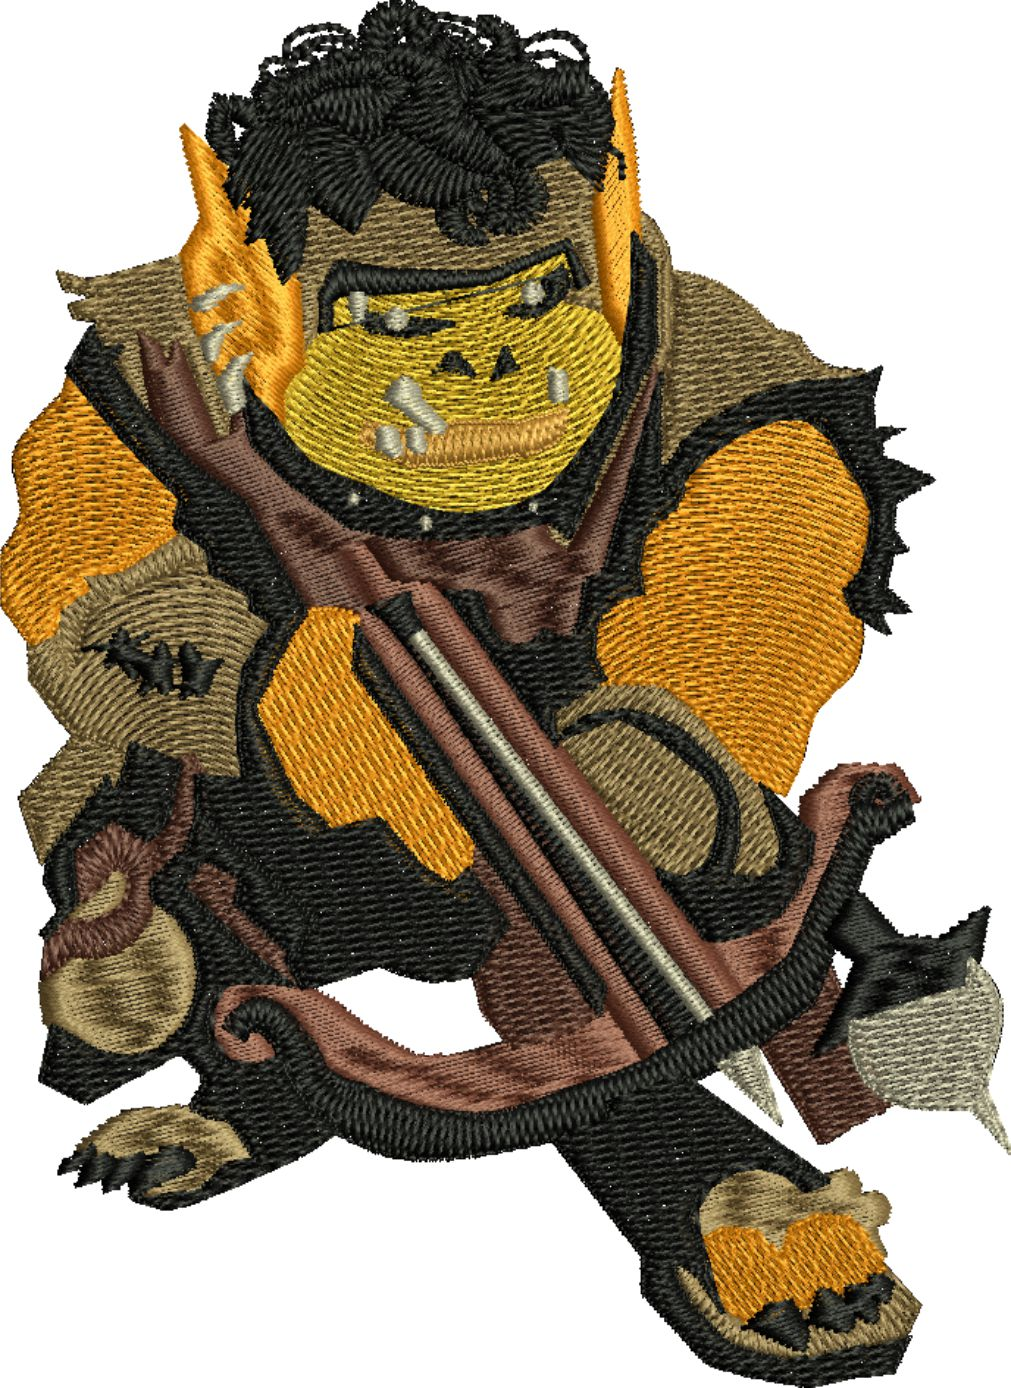 Goonalan-Goonalan, dungeons, dragons, games, machine embroidery